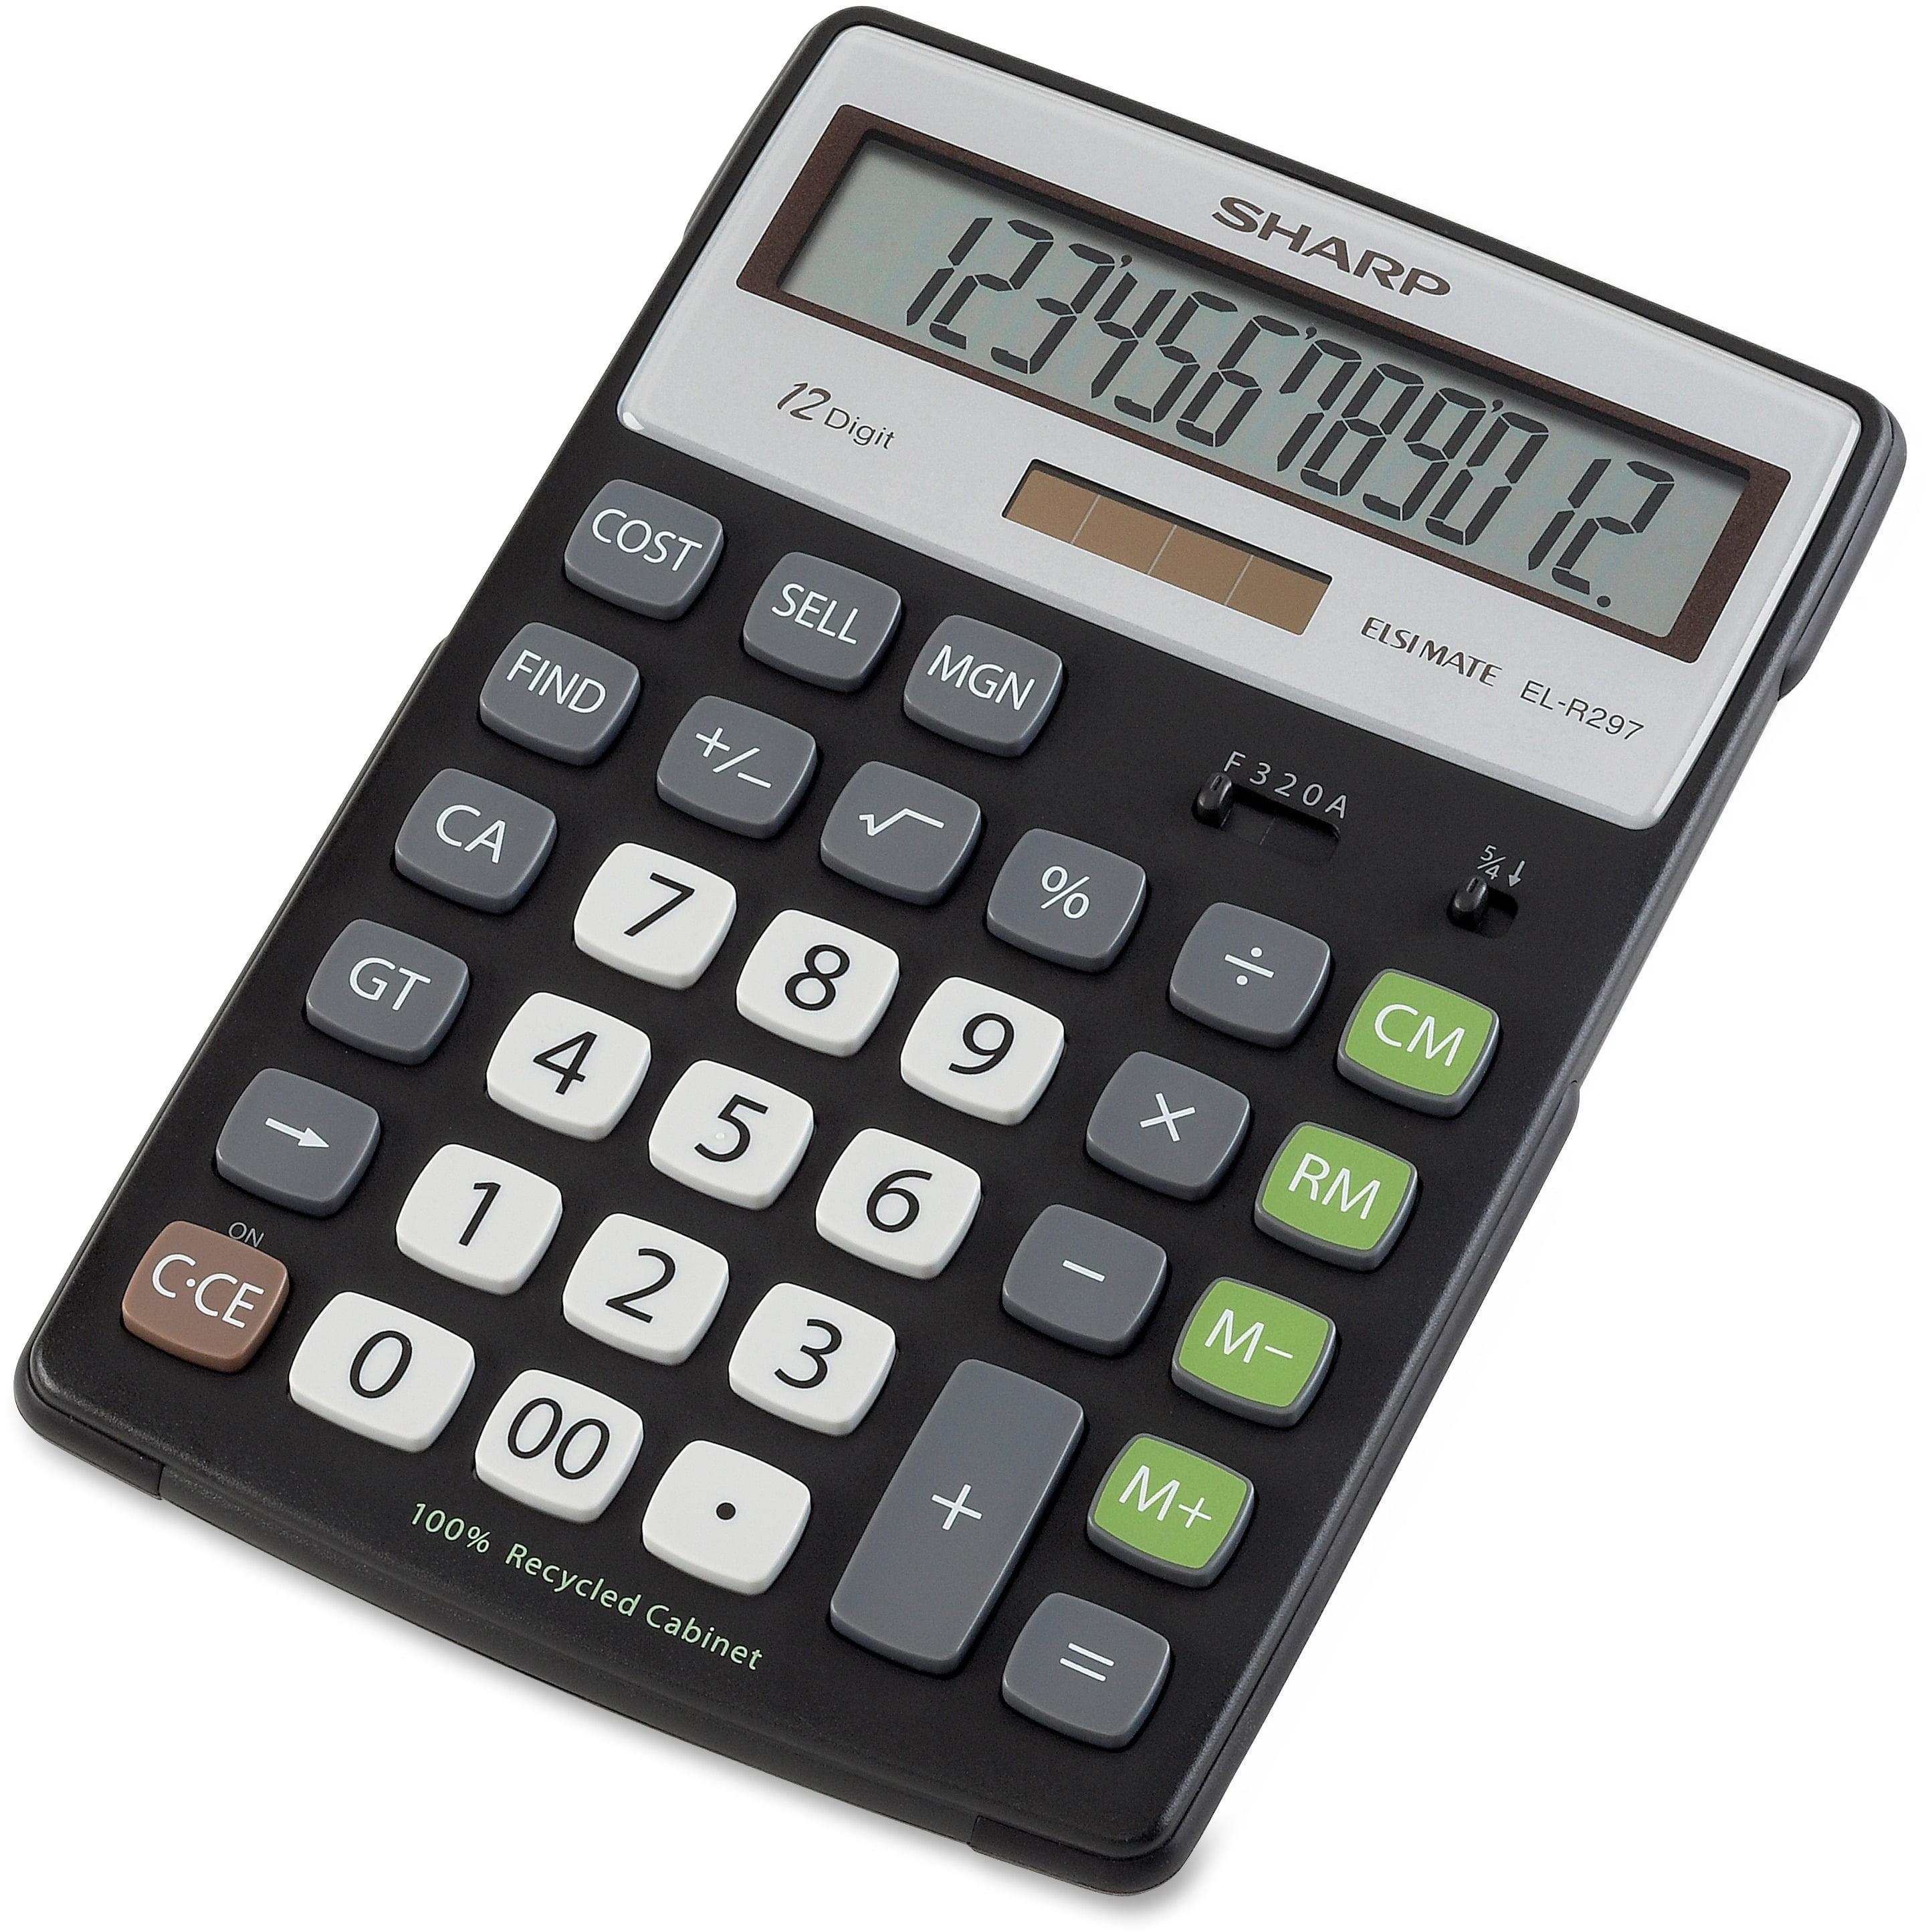 Sharp Calculators, SHRELR297BBK, EL-R297BBK 12-Digit Extra Large Desktop Calculator, 1 Each, Black